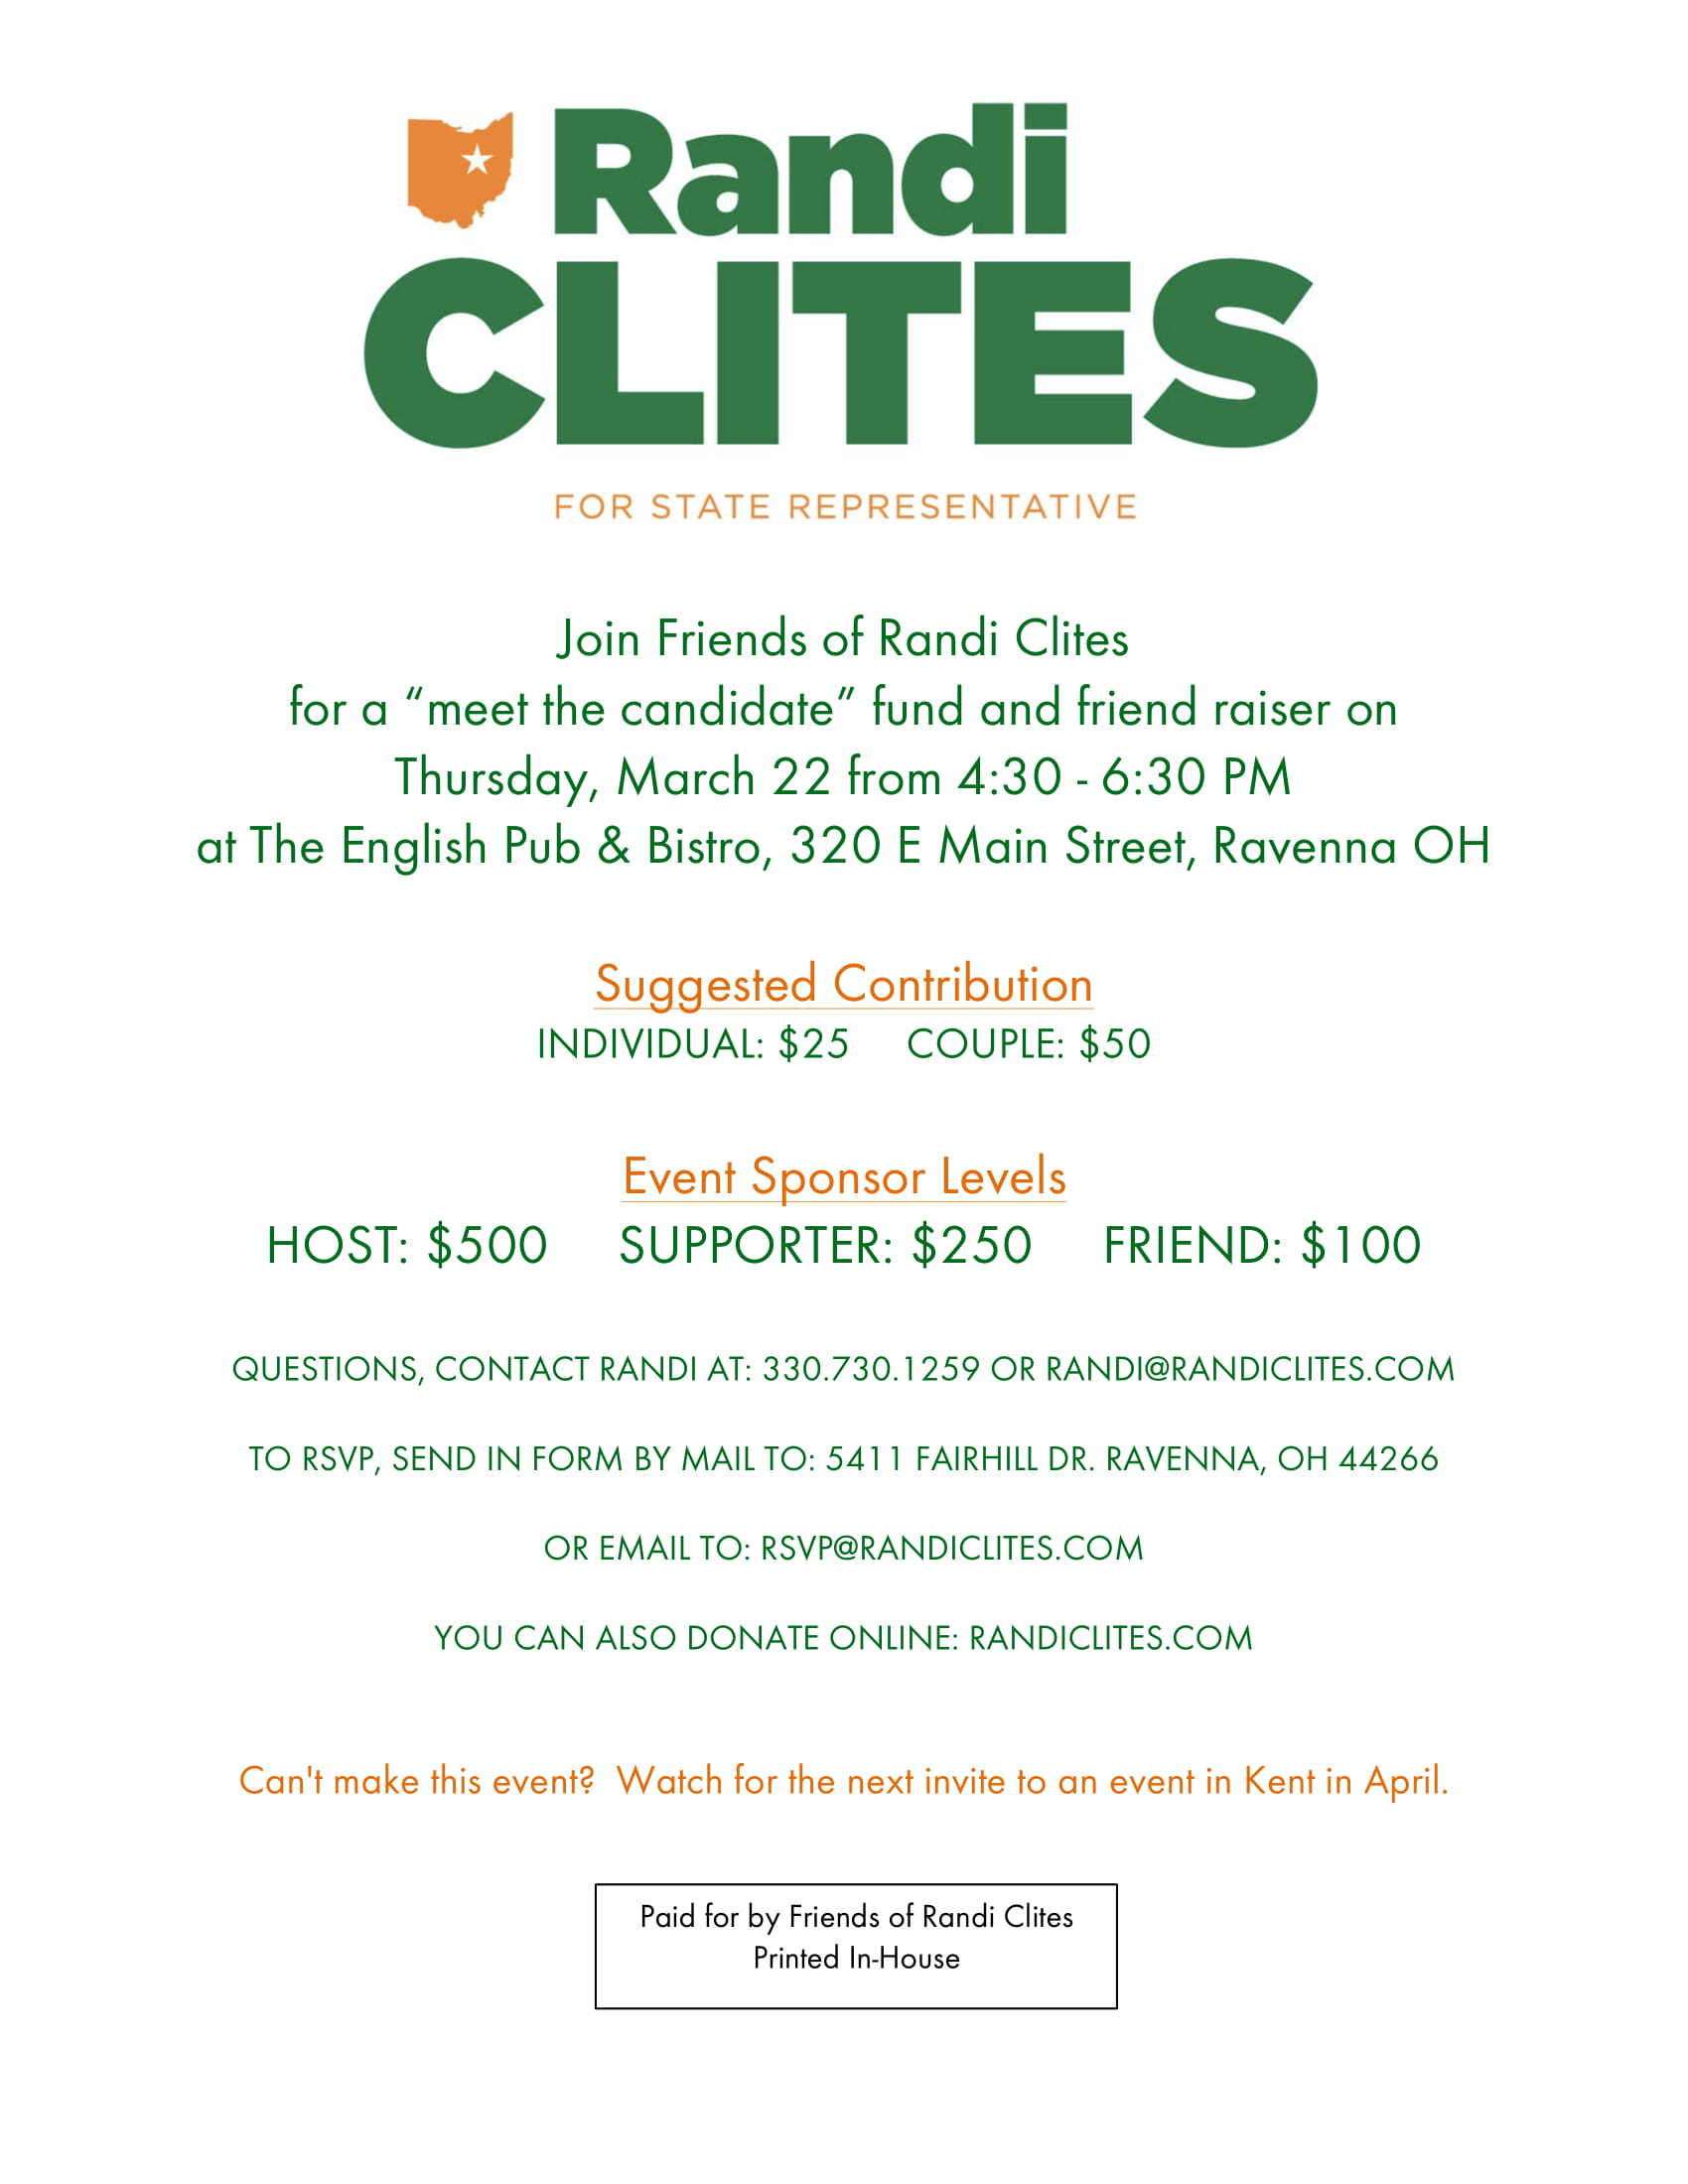 Clites_Invitation_3_22_18-1.jpg